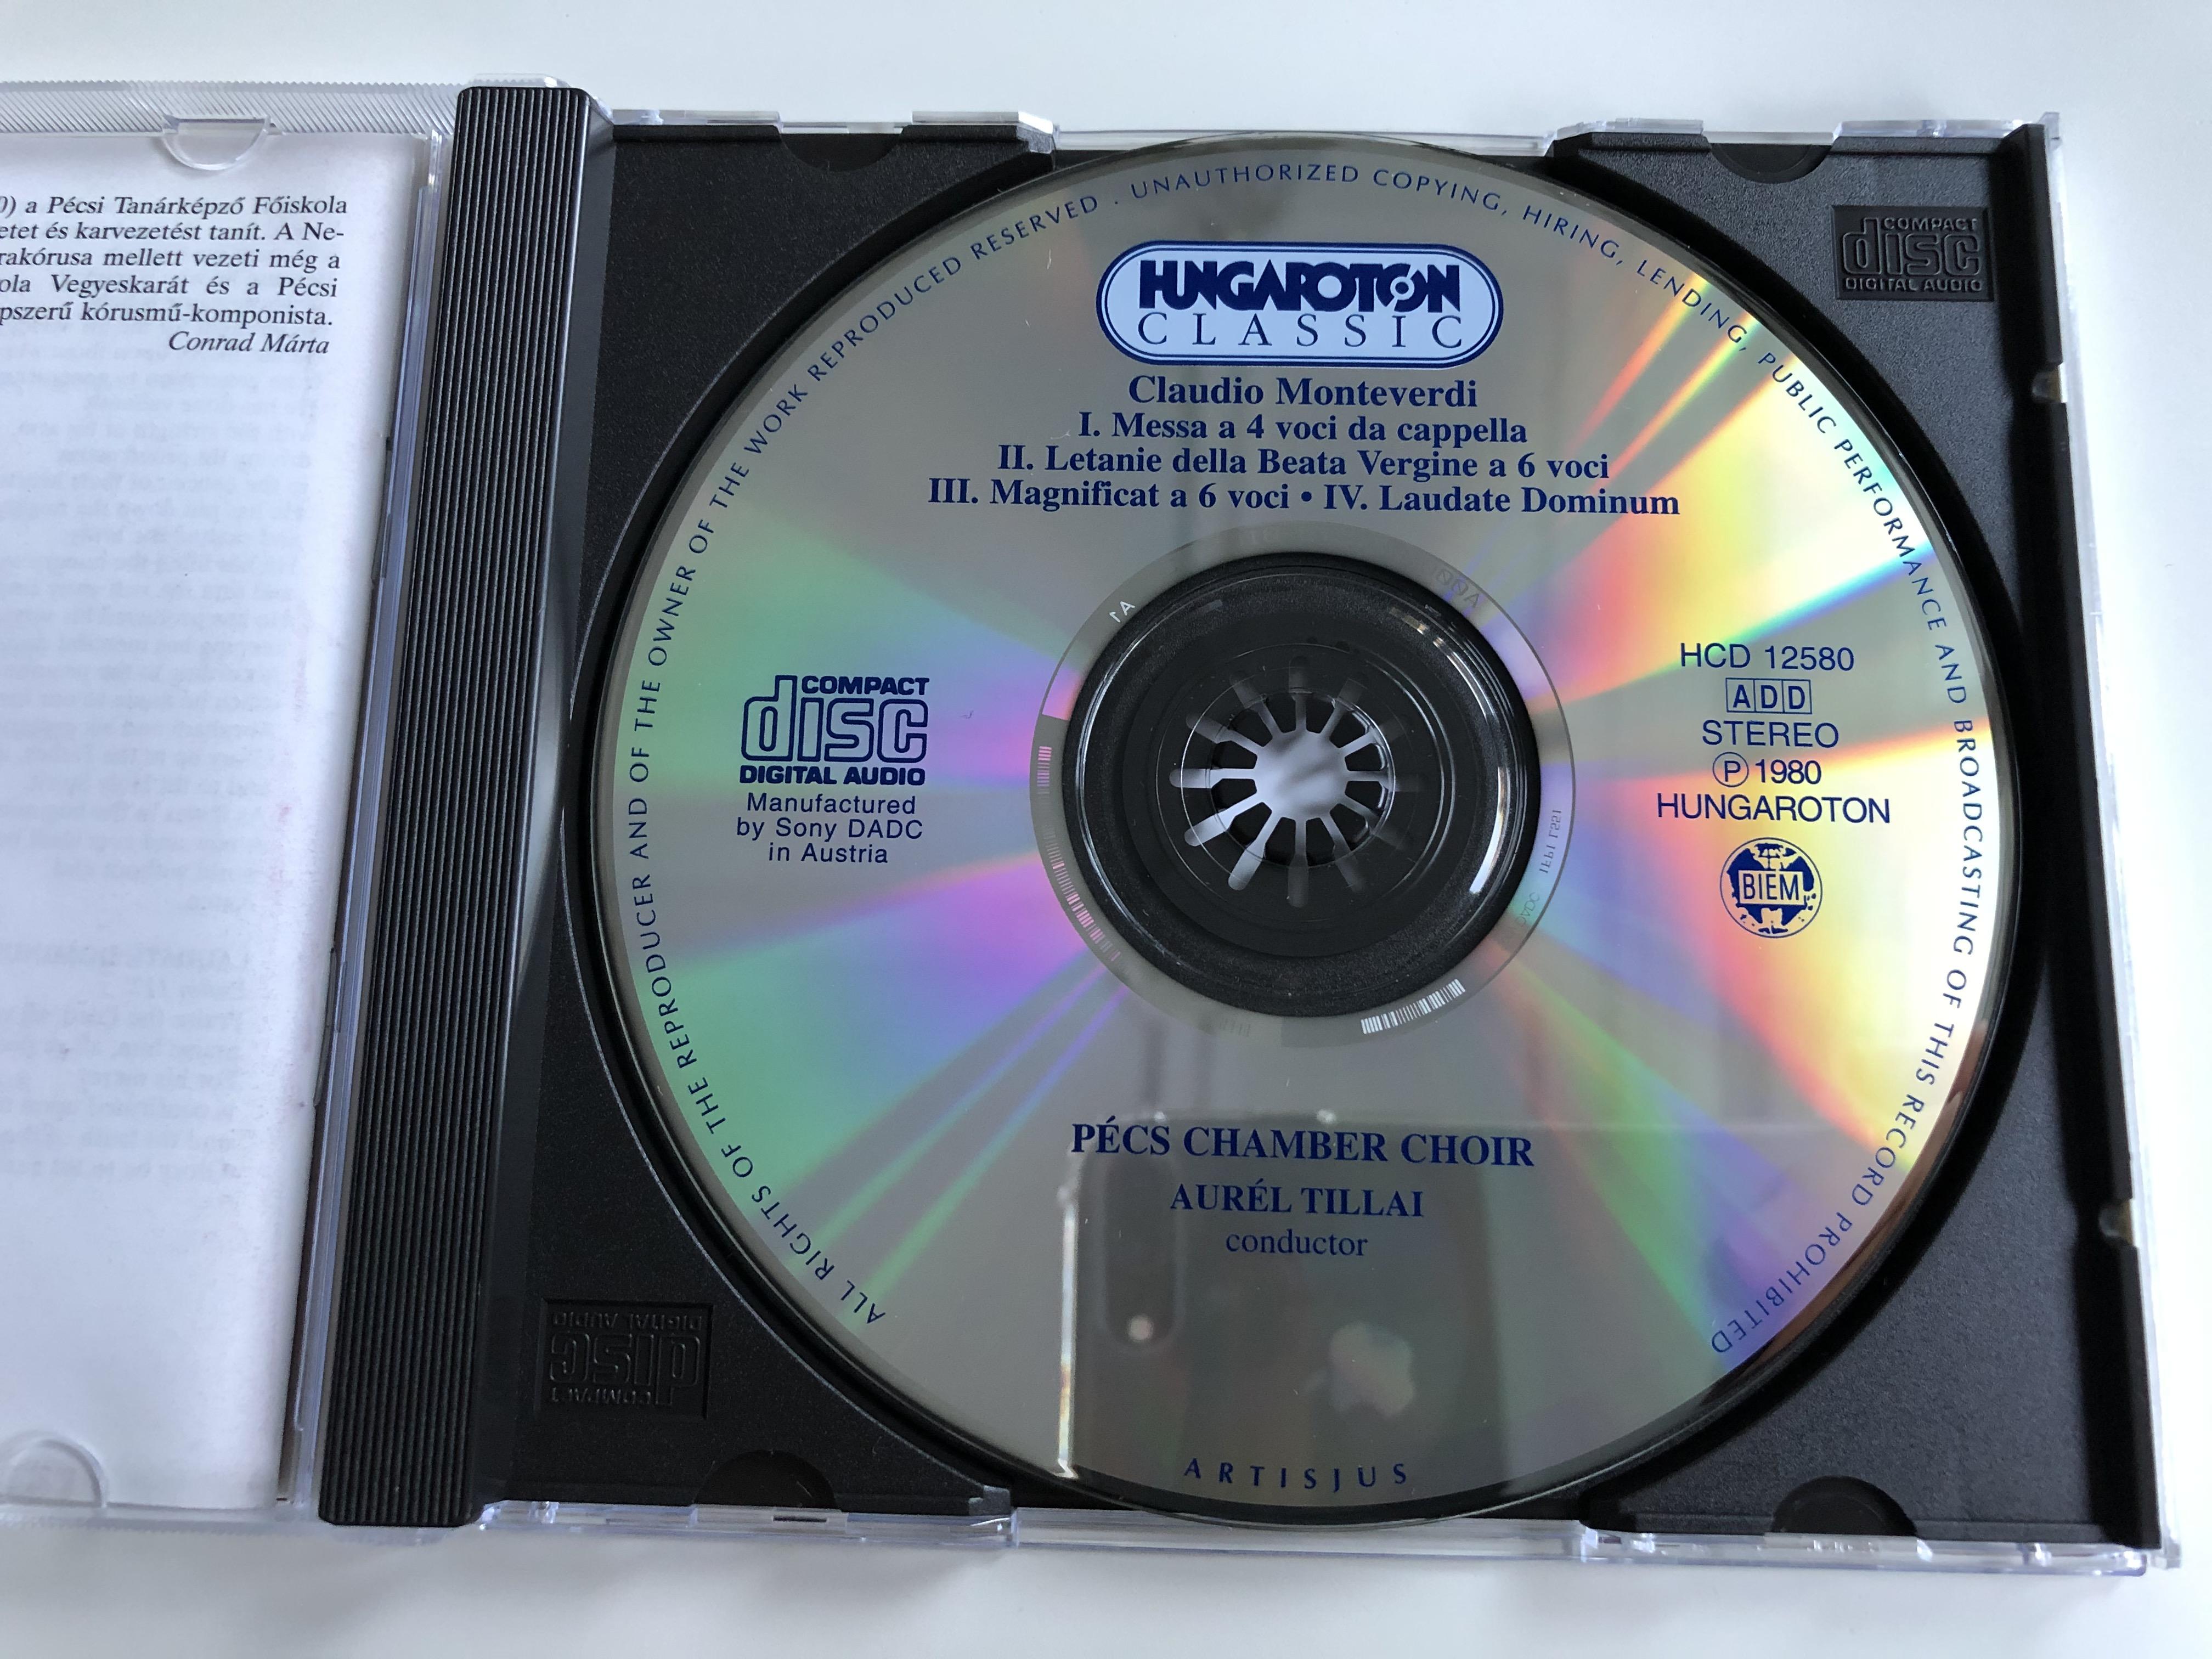 monteverdi-messa-a-4-voci-da-cappella-letanie-della-beata-vergine-a-6-voci-magnificat-a-6-voci-laudate-dominum-p-cs-chamber-choir-aur-l-tillai-hungaroton-classic-audio-cd-1980-stereo-h-10-.jpg